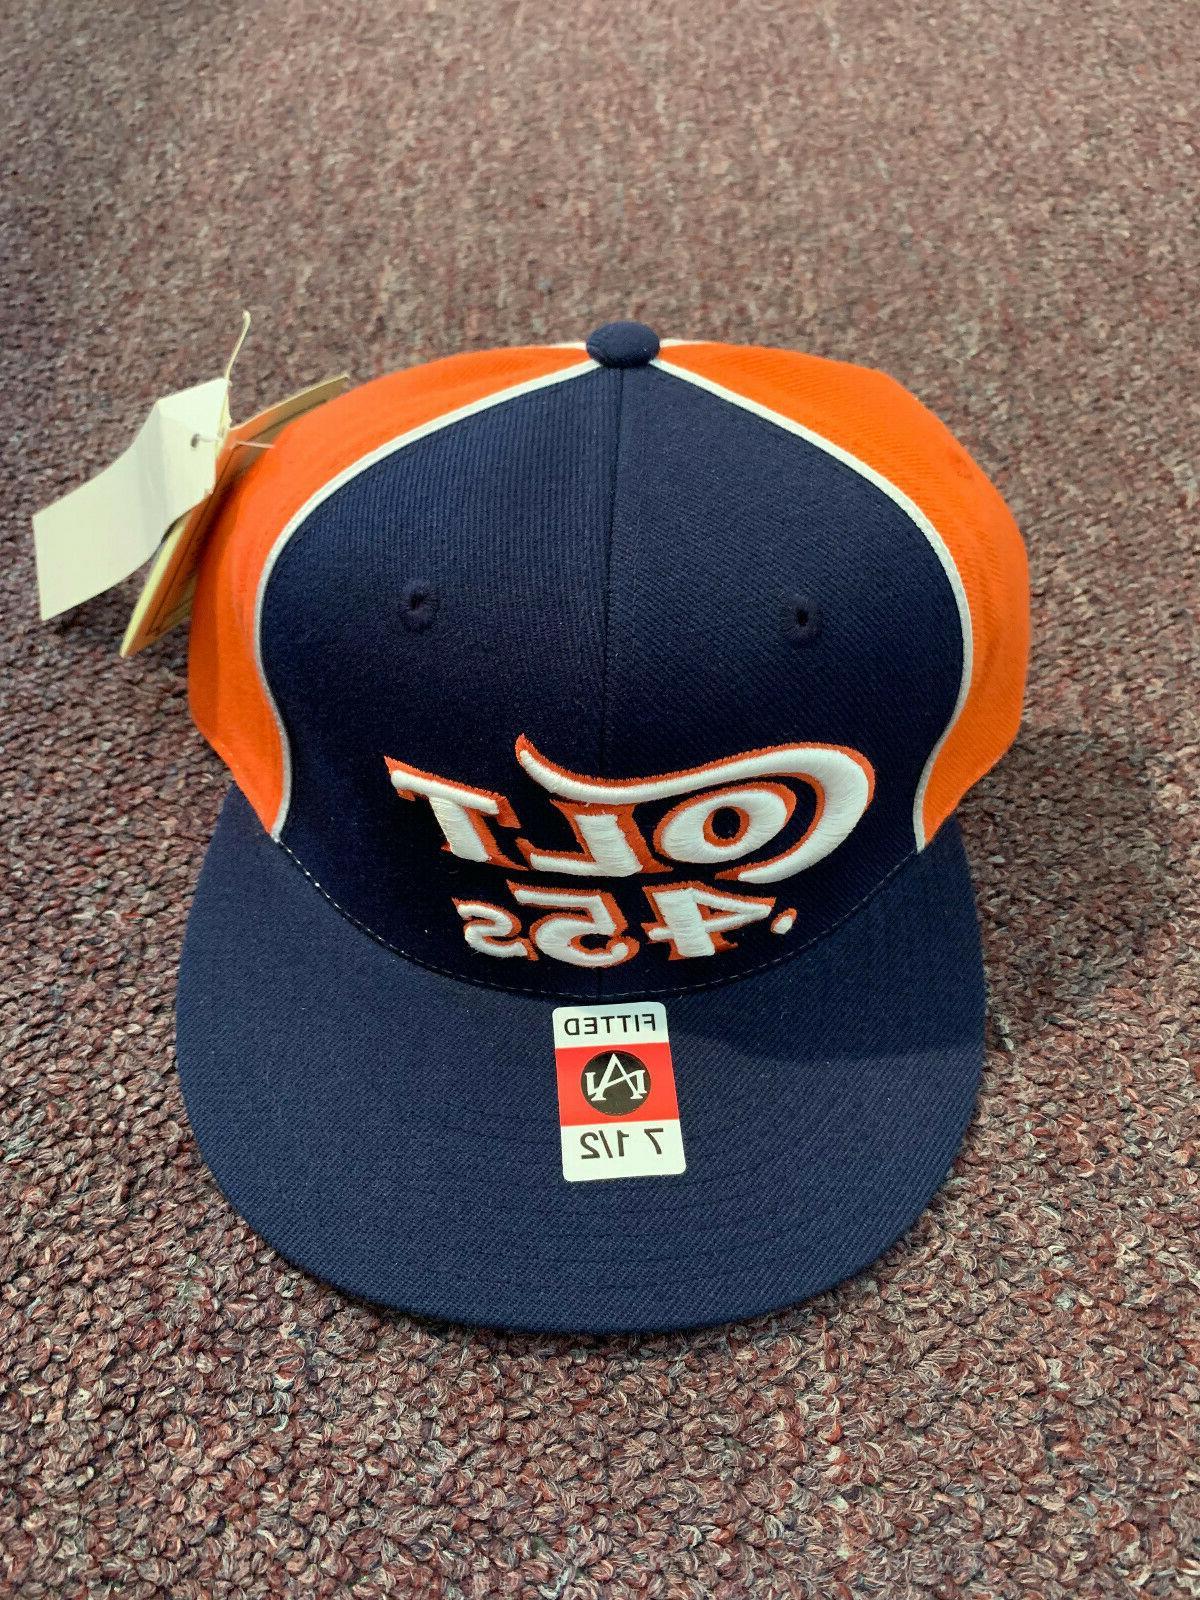 Baseball Caps, Size 7-1/2, Reebok and New Original